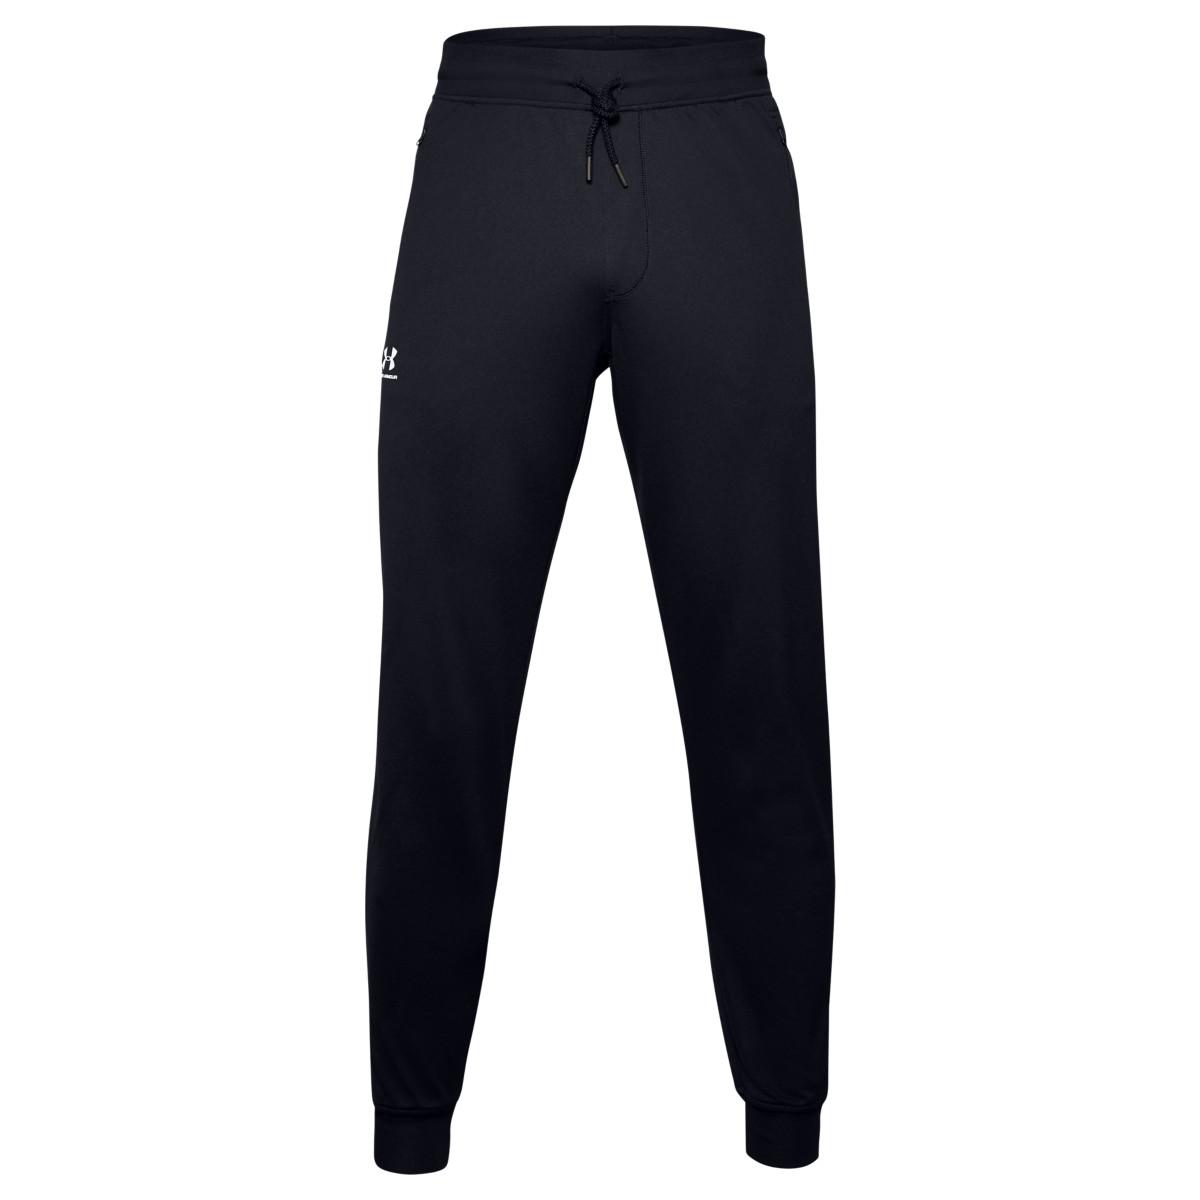 Foto de Under Armour UA Sportstyle Pantalones Deportivos Para Hombres - Black/White